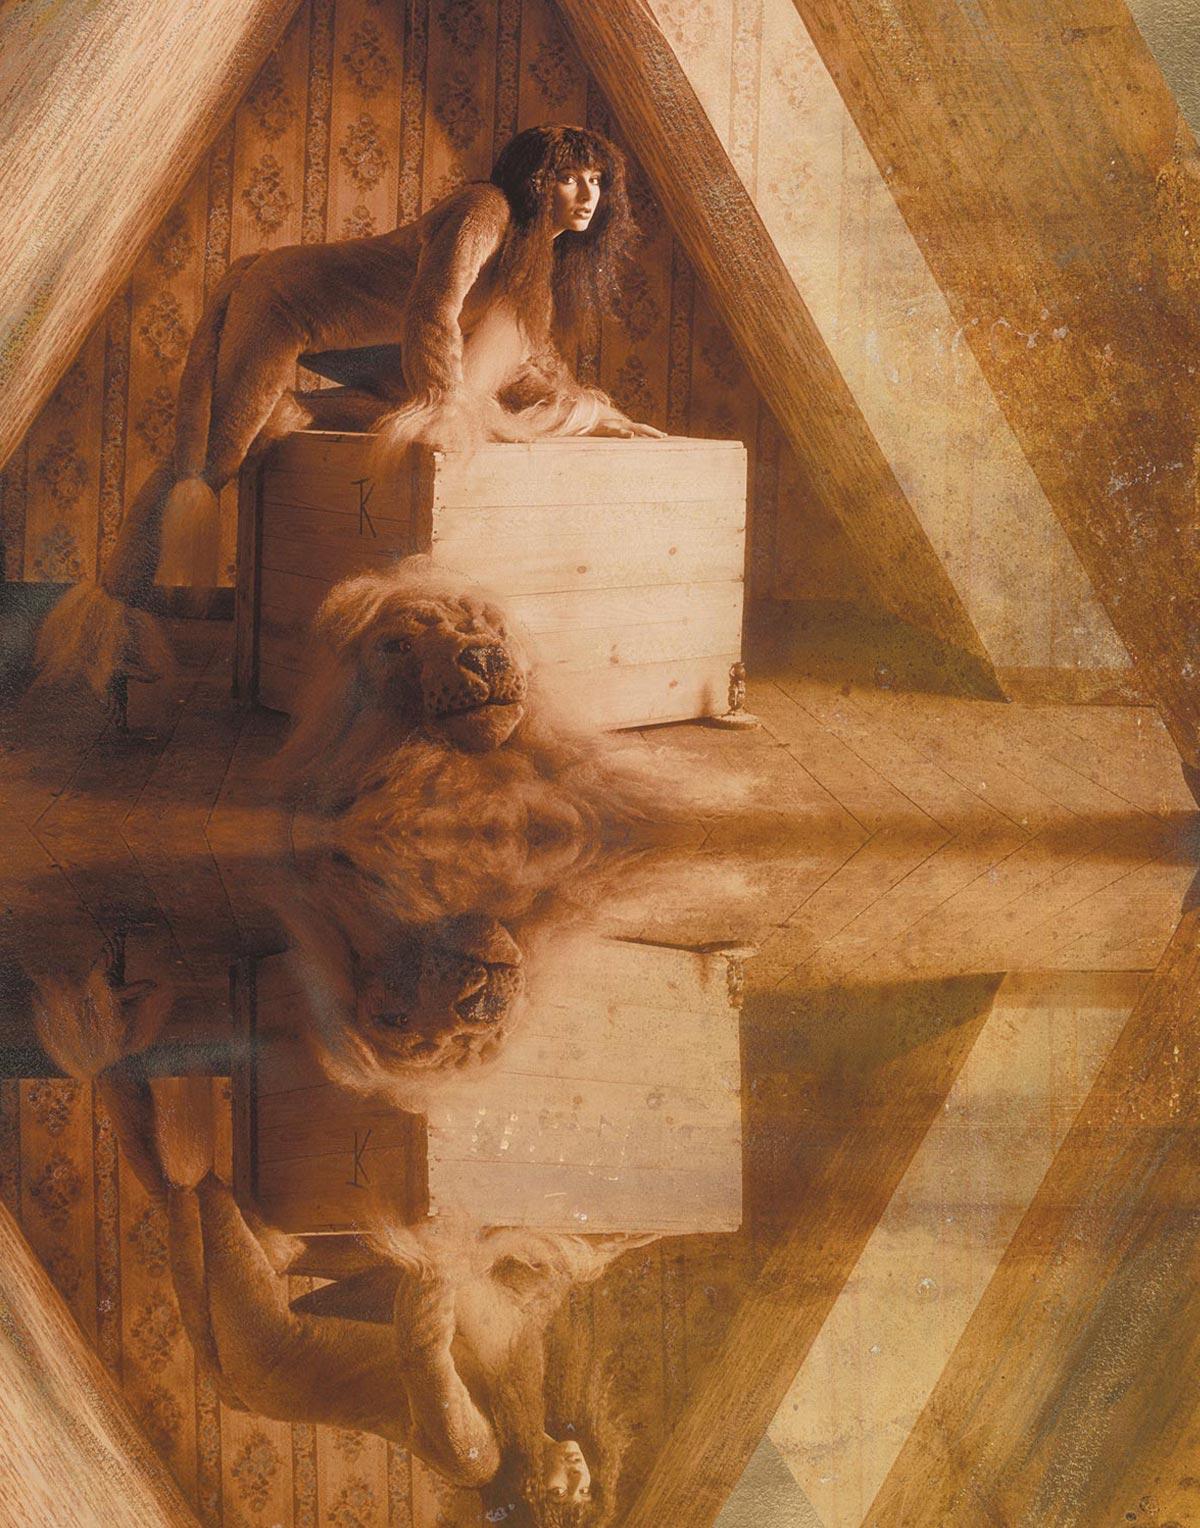 Golden Slumber featuring Kate Bush